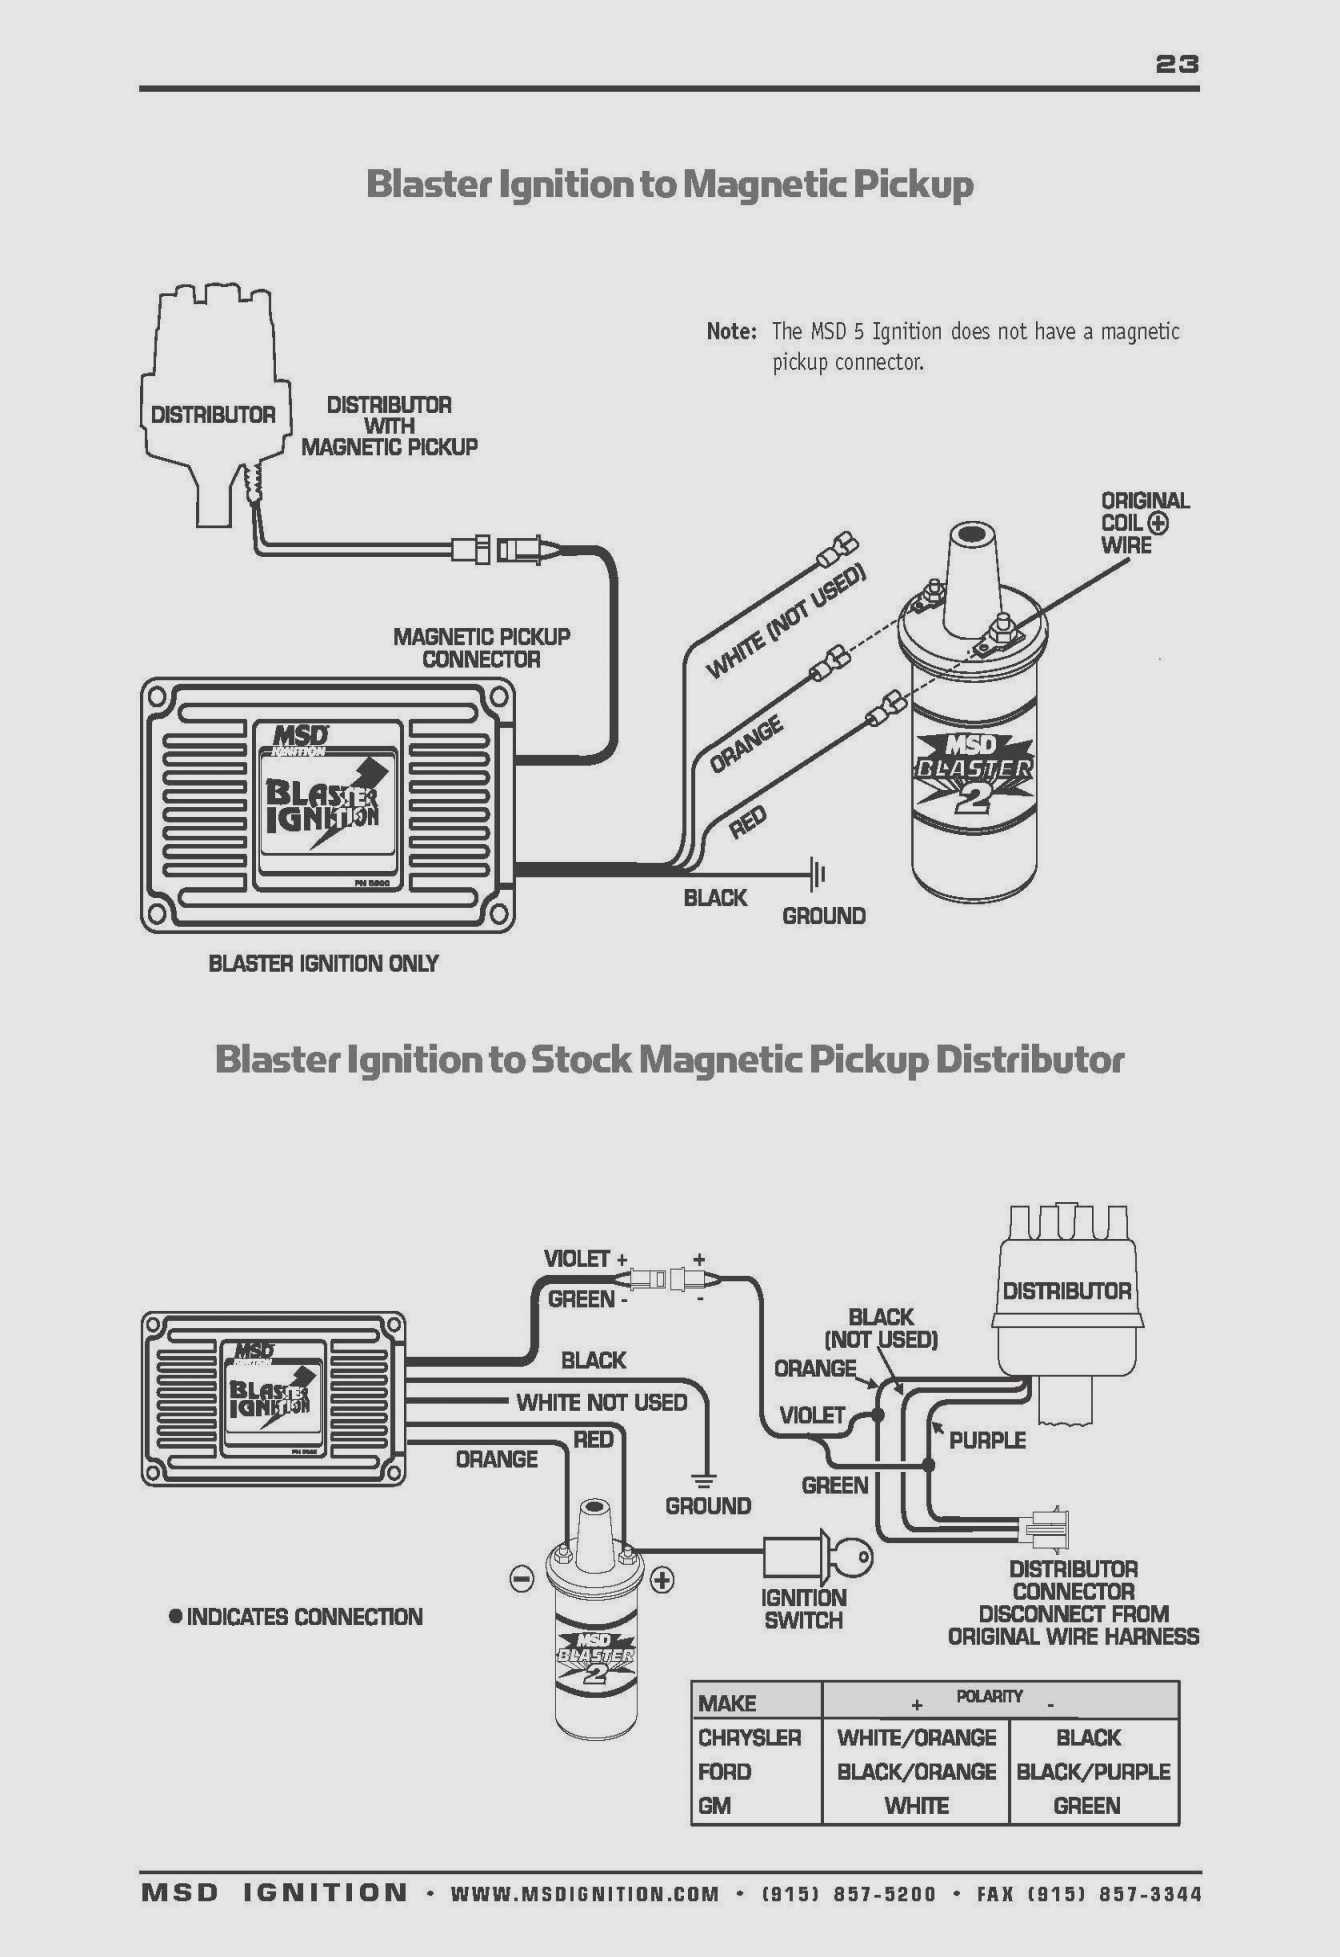 Sunpro Super Tach Ii Wiring | Wiring Diagram - Sunpro Super Tach 2 Wiring Diagram